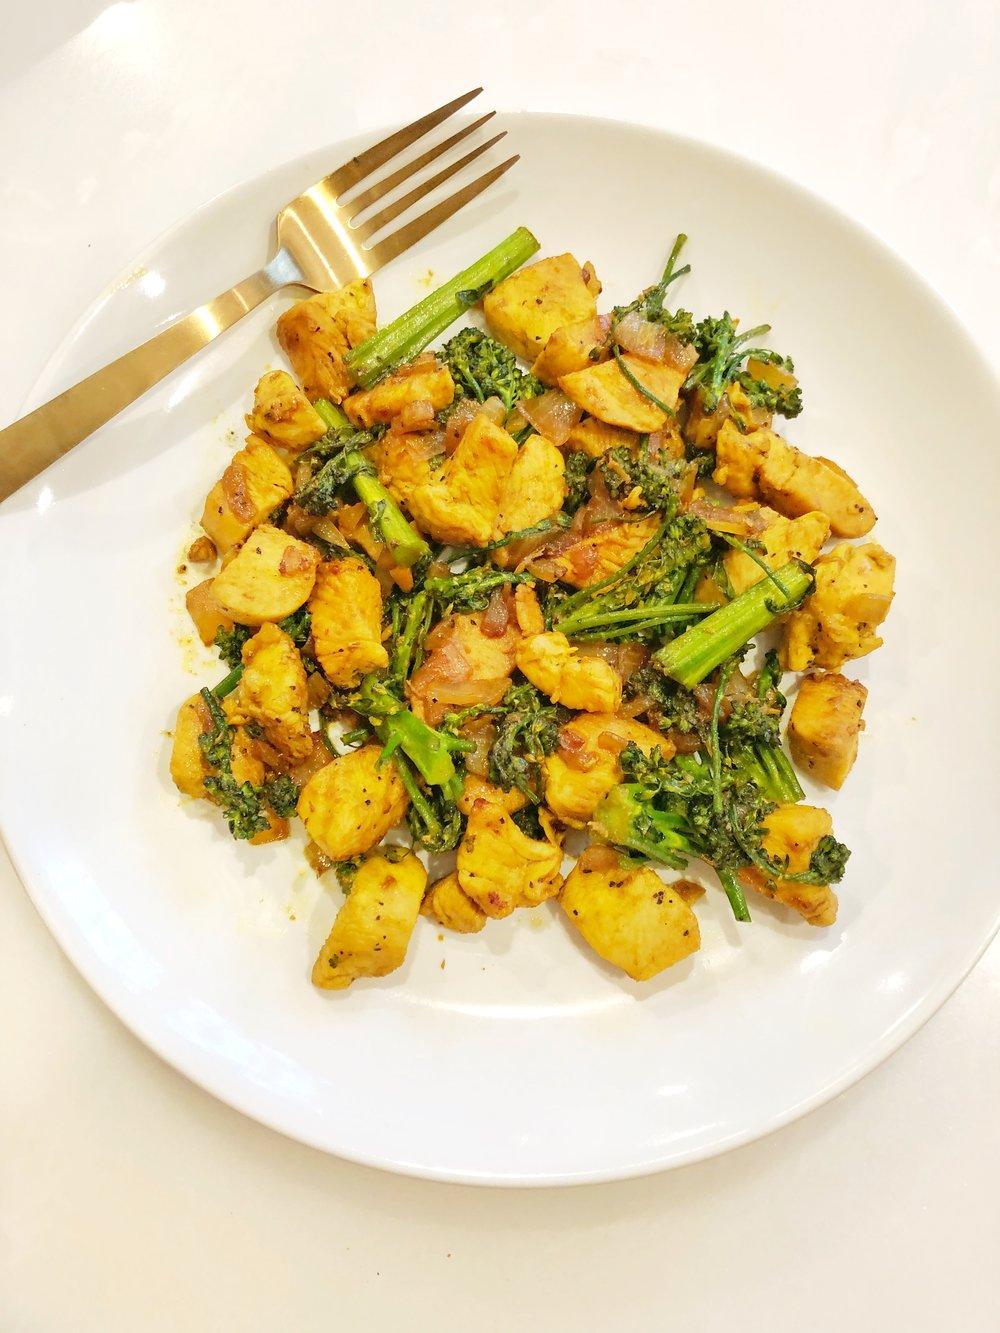 IMG_1422.jpg-chicken-turmeric-broccolini-stir-fry-dinner